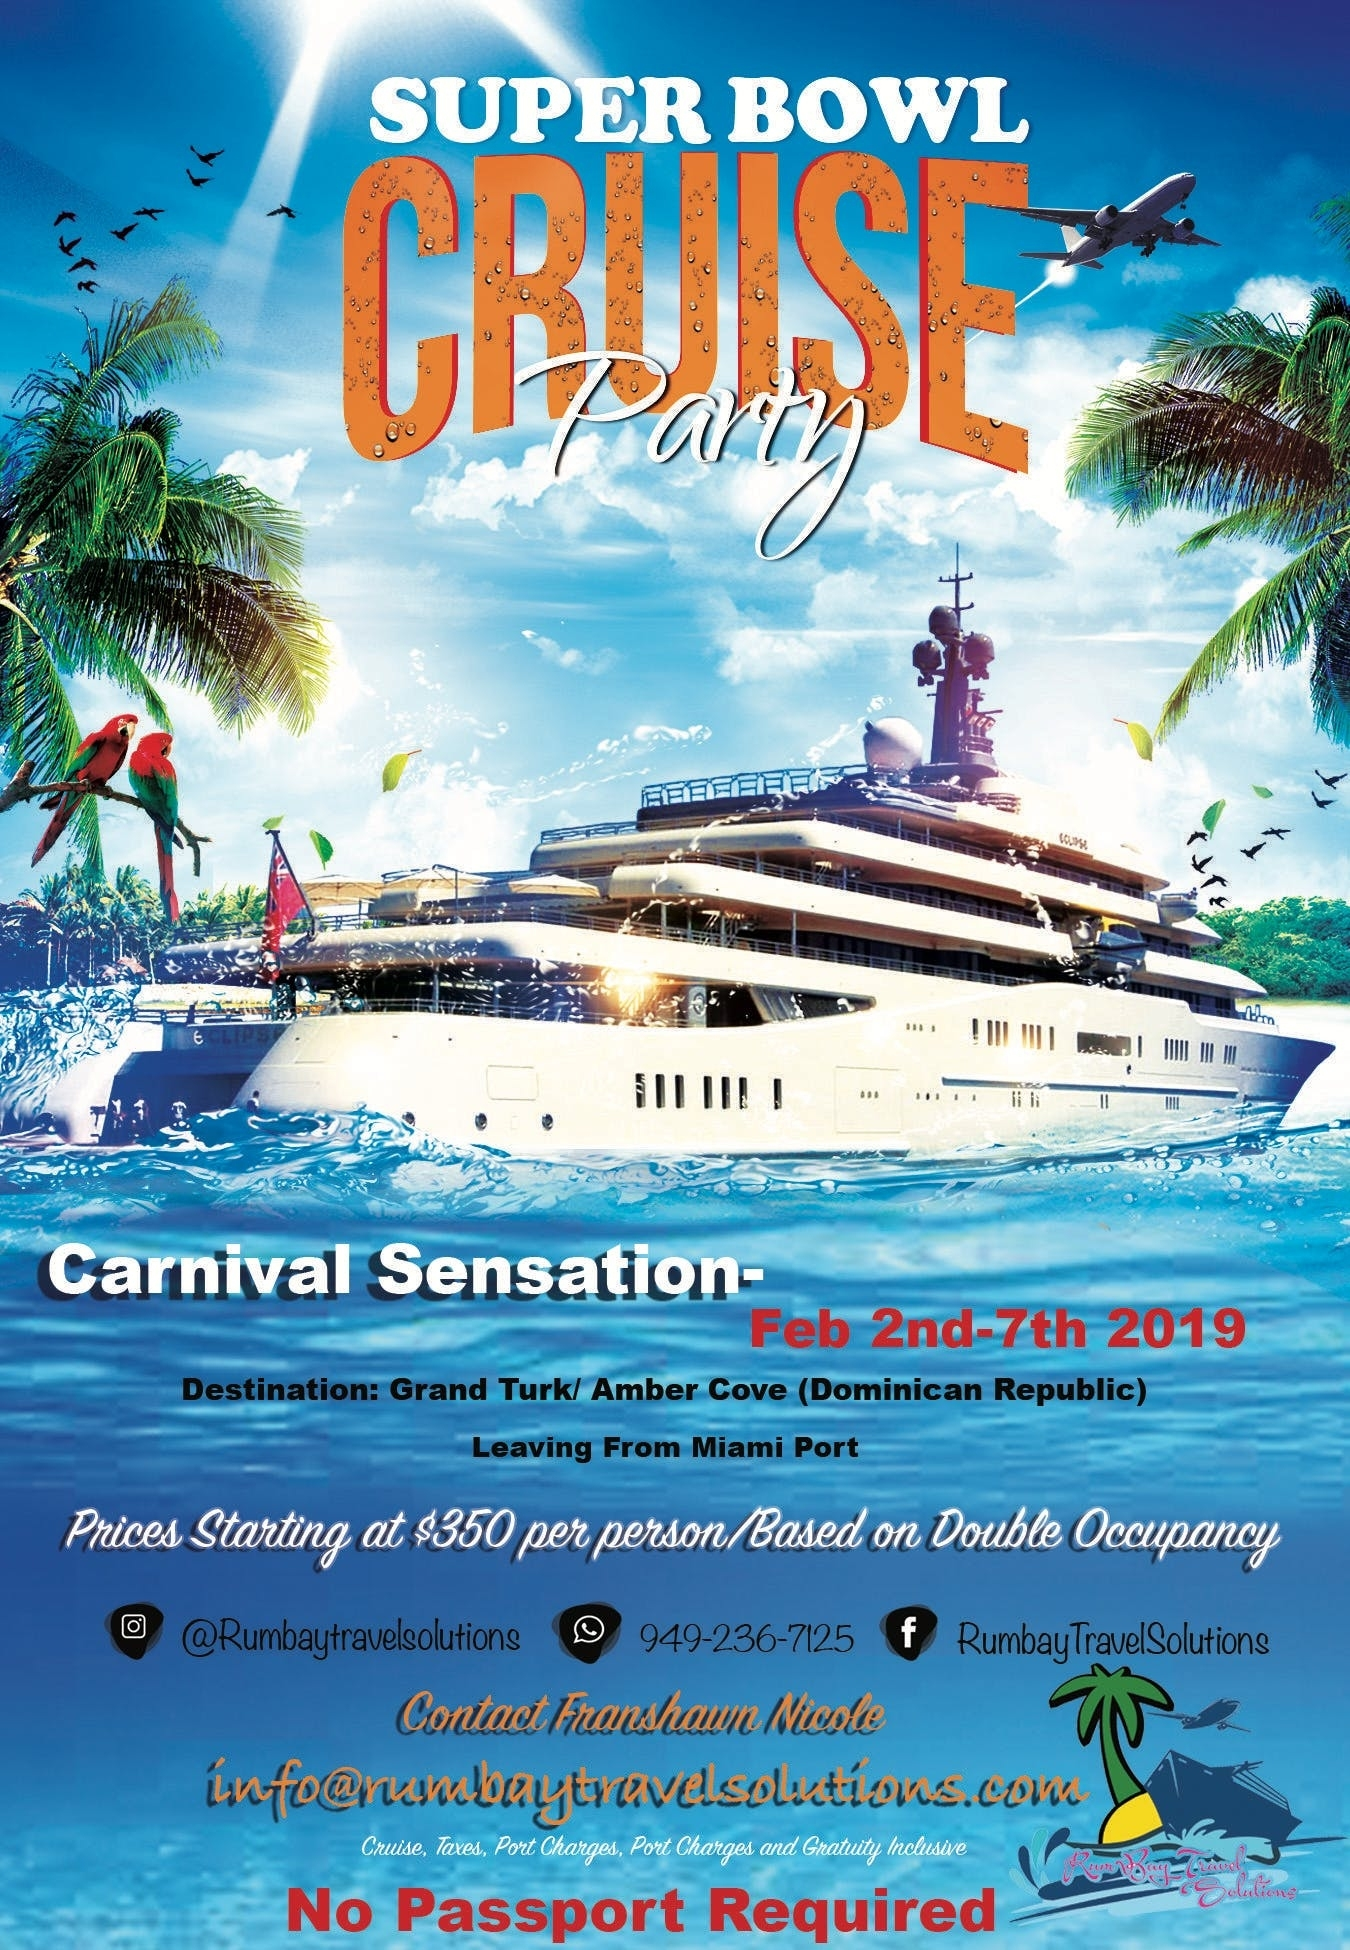 Superbowl Cruise 2019 Amber Cove, Dominican Republic/grand regarding Miami Super Bowl Cruise